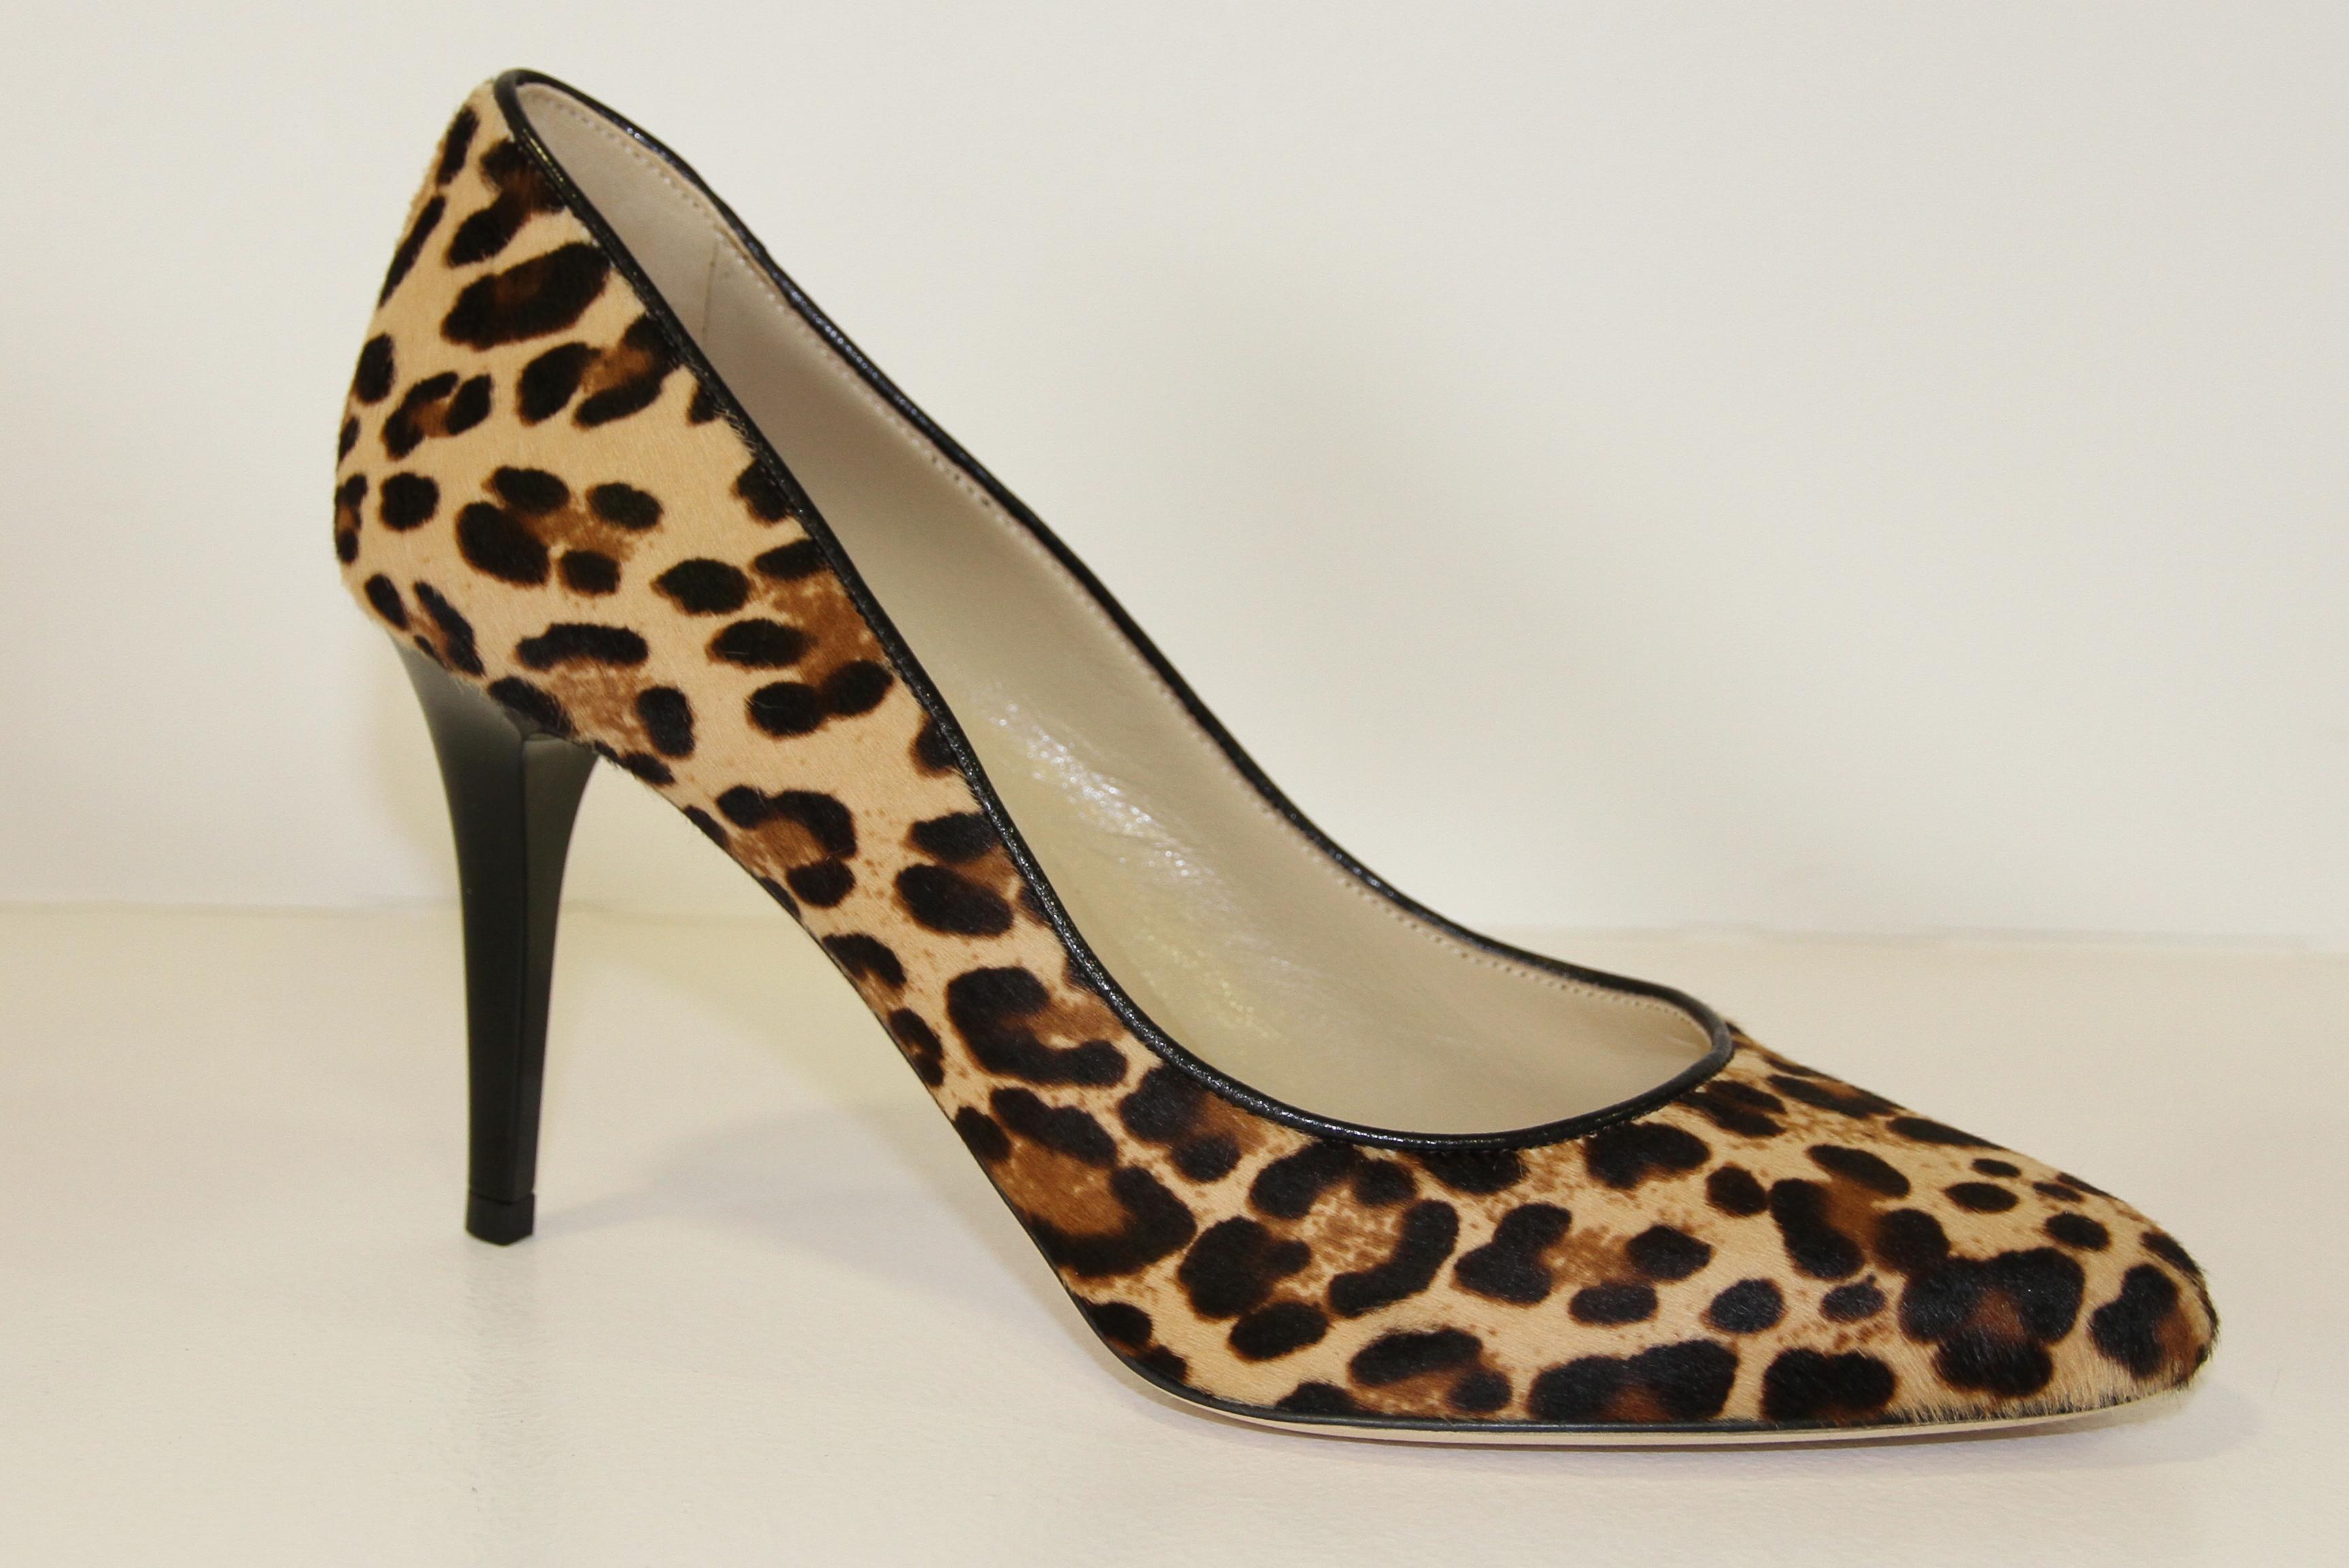 e8a0b9ac020ee escarpin leopard jimmy choo rouen - Le Buzz de Rouen